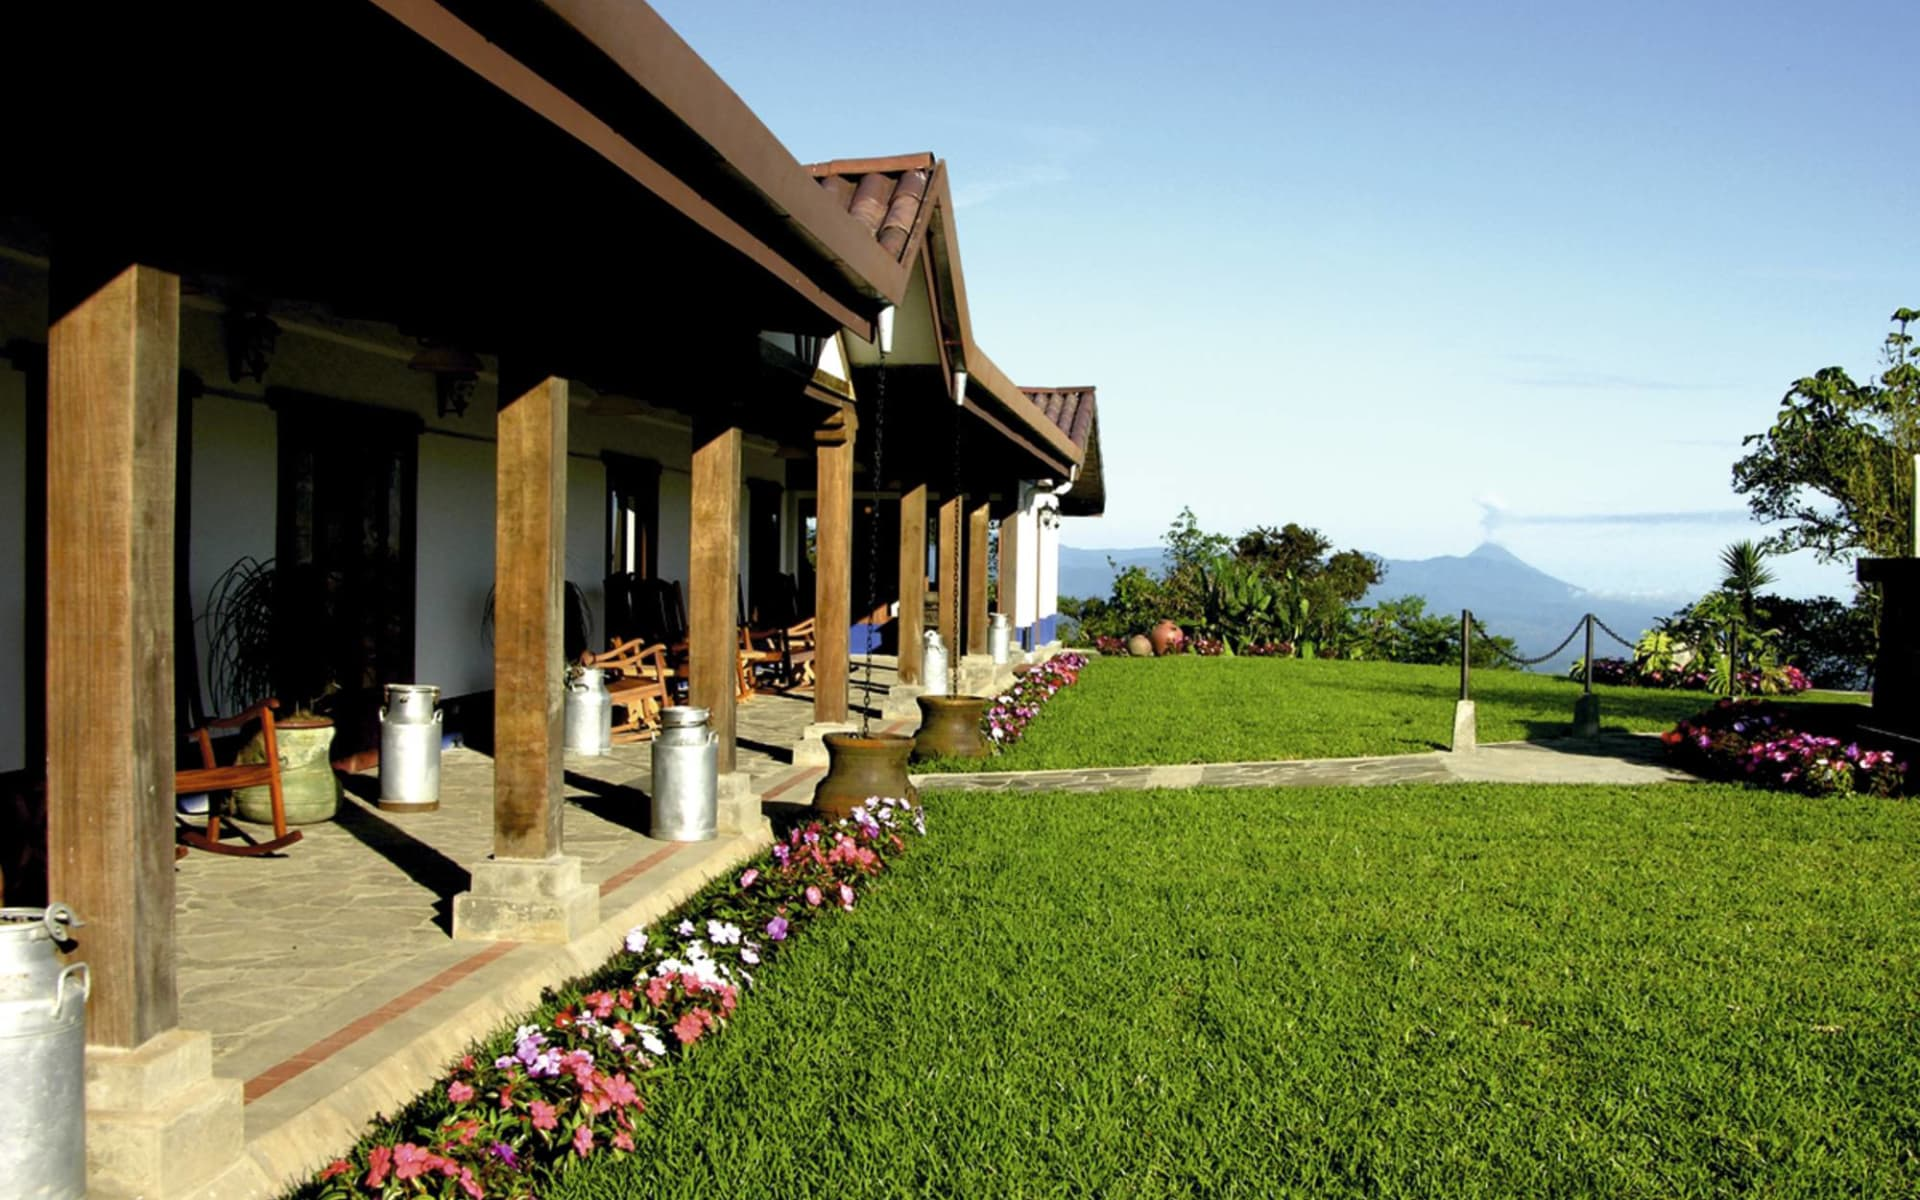 Villa Blanca Cloud Forest Hotel in San Ramon: exterior villa blanca cloudforest hotel garten